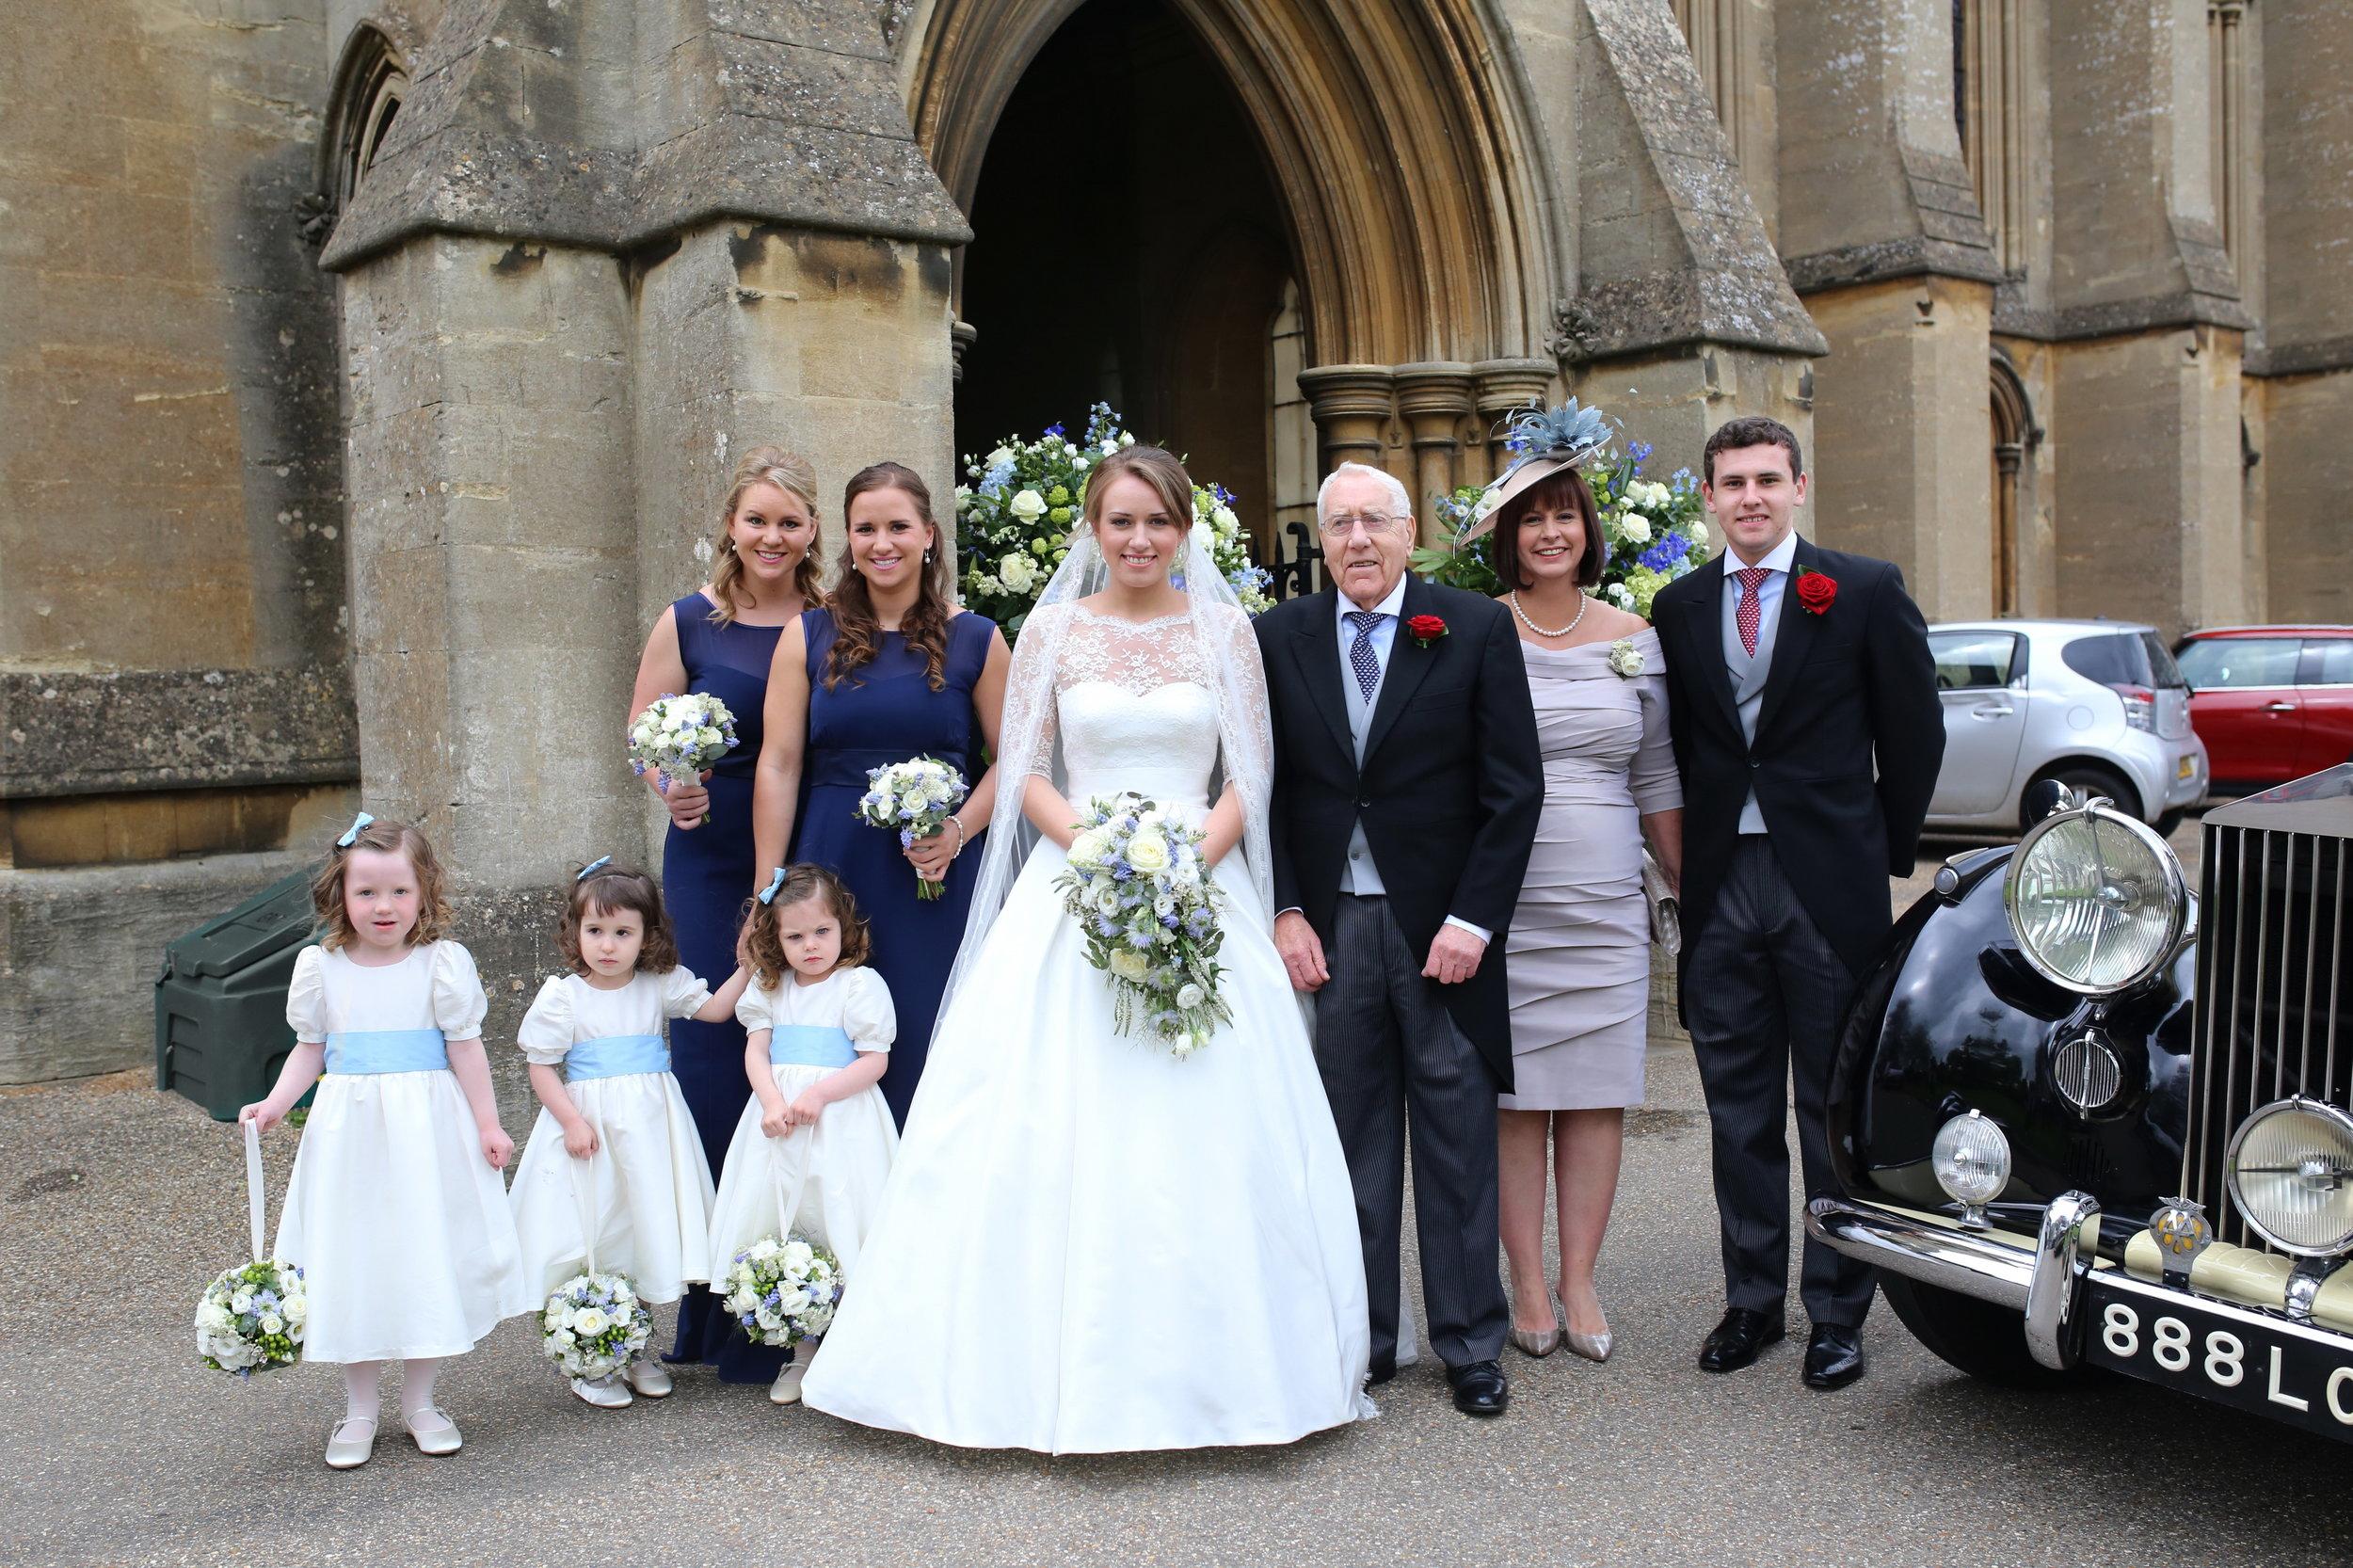 MIRIAM_FAITH_WEDDING_FLOWERS_BRIDE_BOUQUET_POMANDER_BRIDESMAIDS.JPG